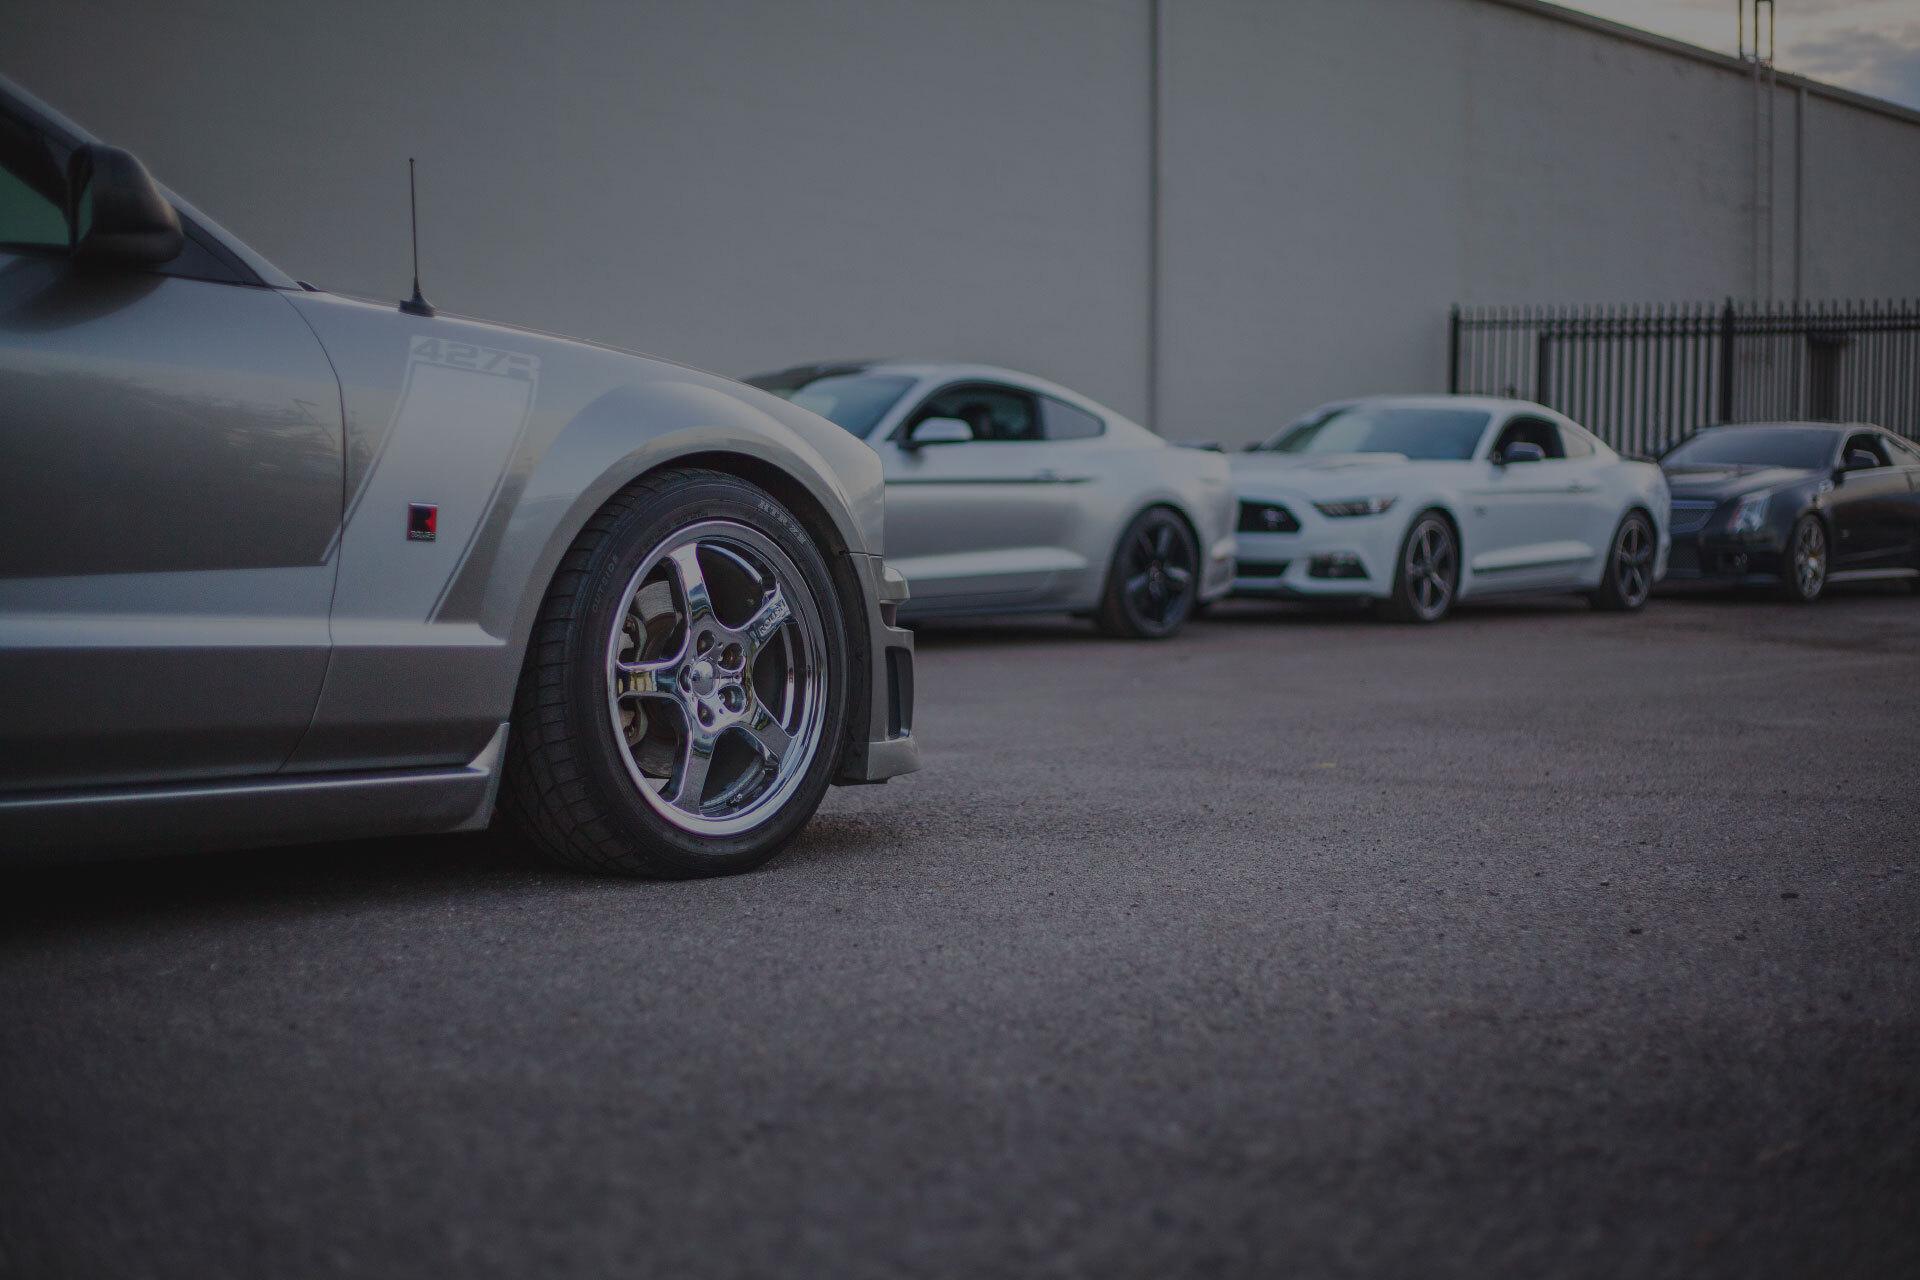 Used Cars Dallas | Dallas Hot Rods | Texas Hot Rides